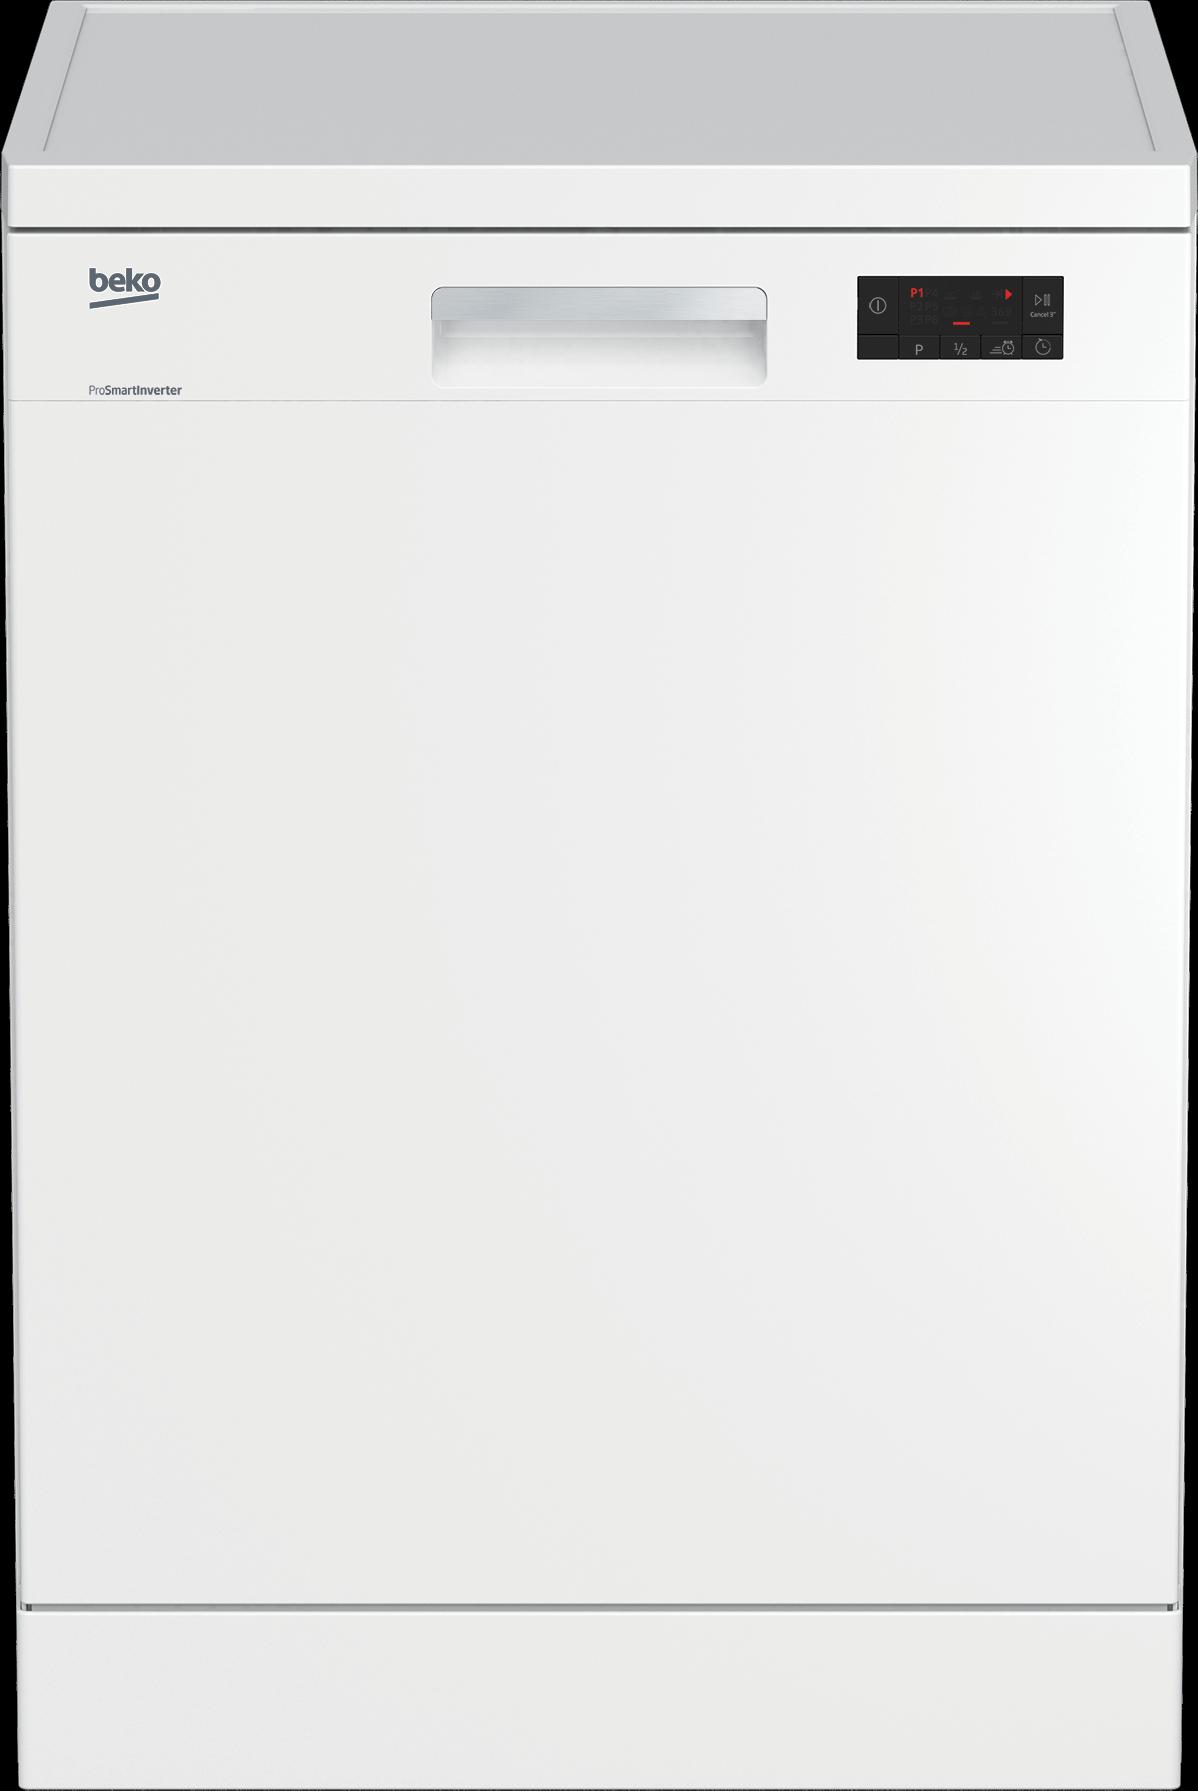 Máy rửa chén độc lập DFN16410W